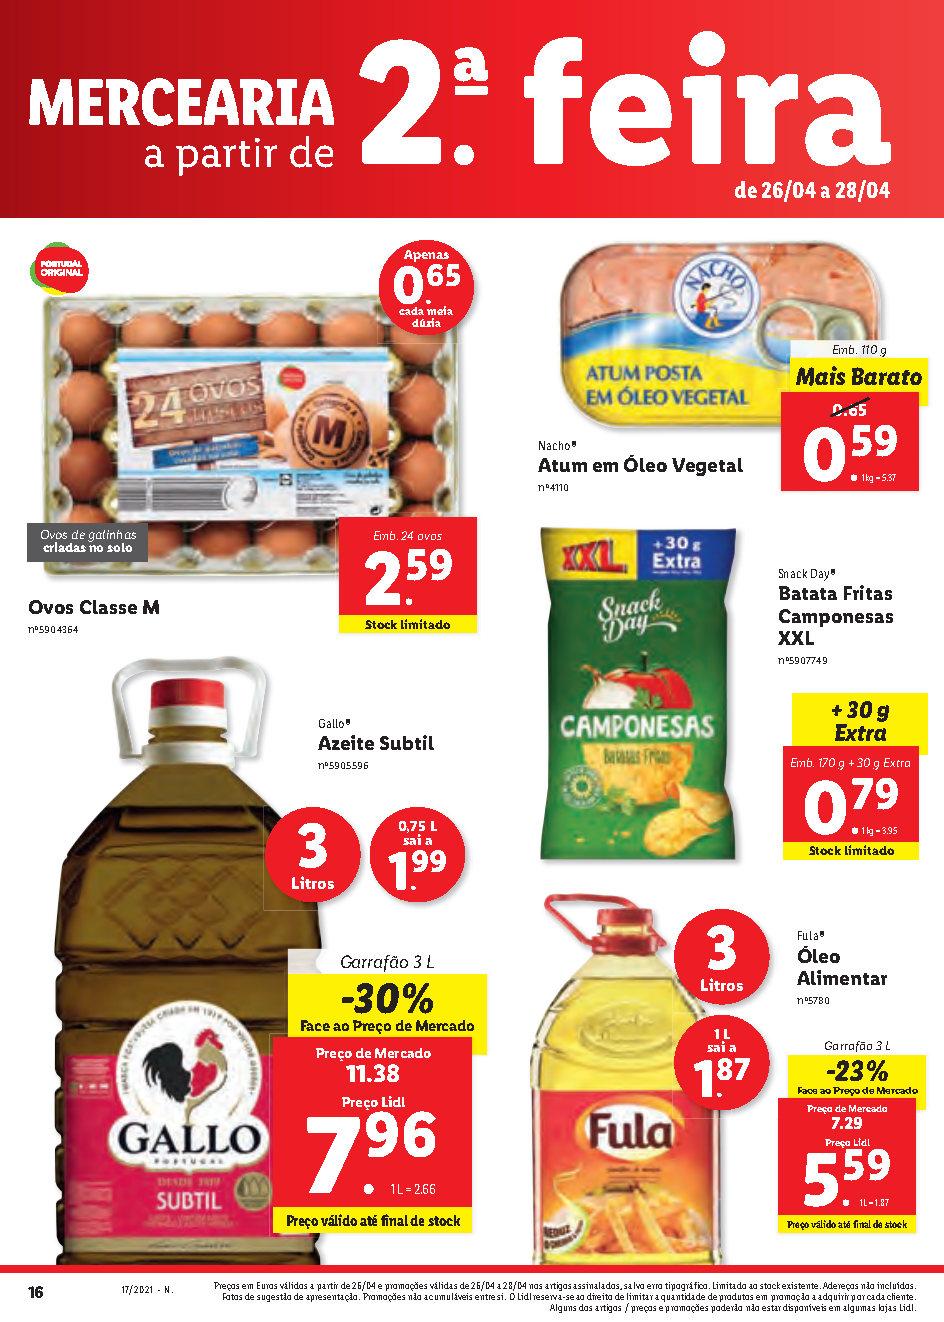 0 antevisao folheto lidl bazar 26 abril promocoes Page1 16